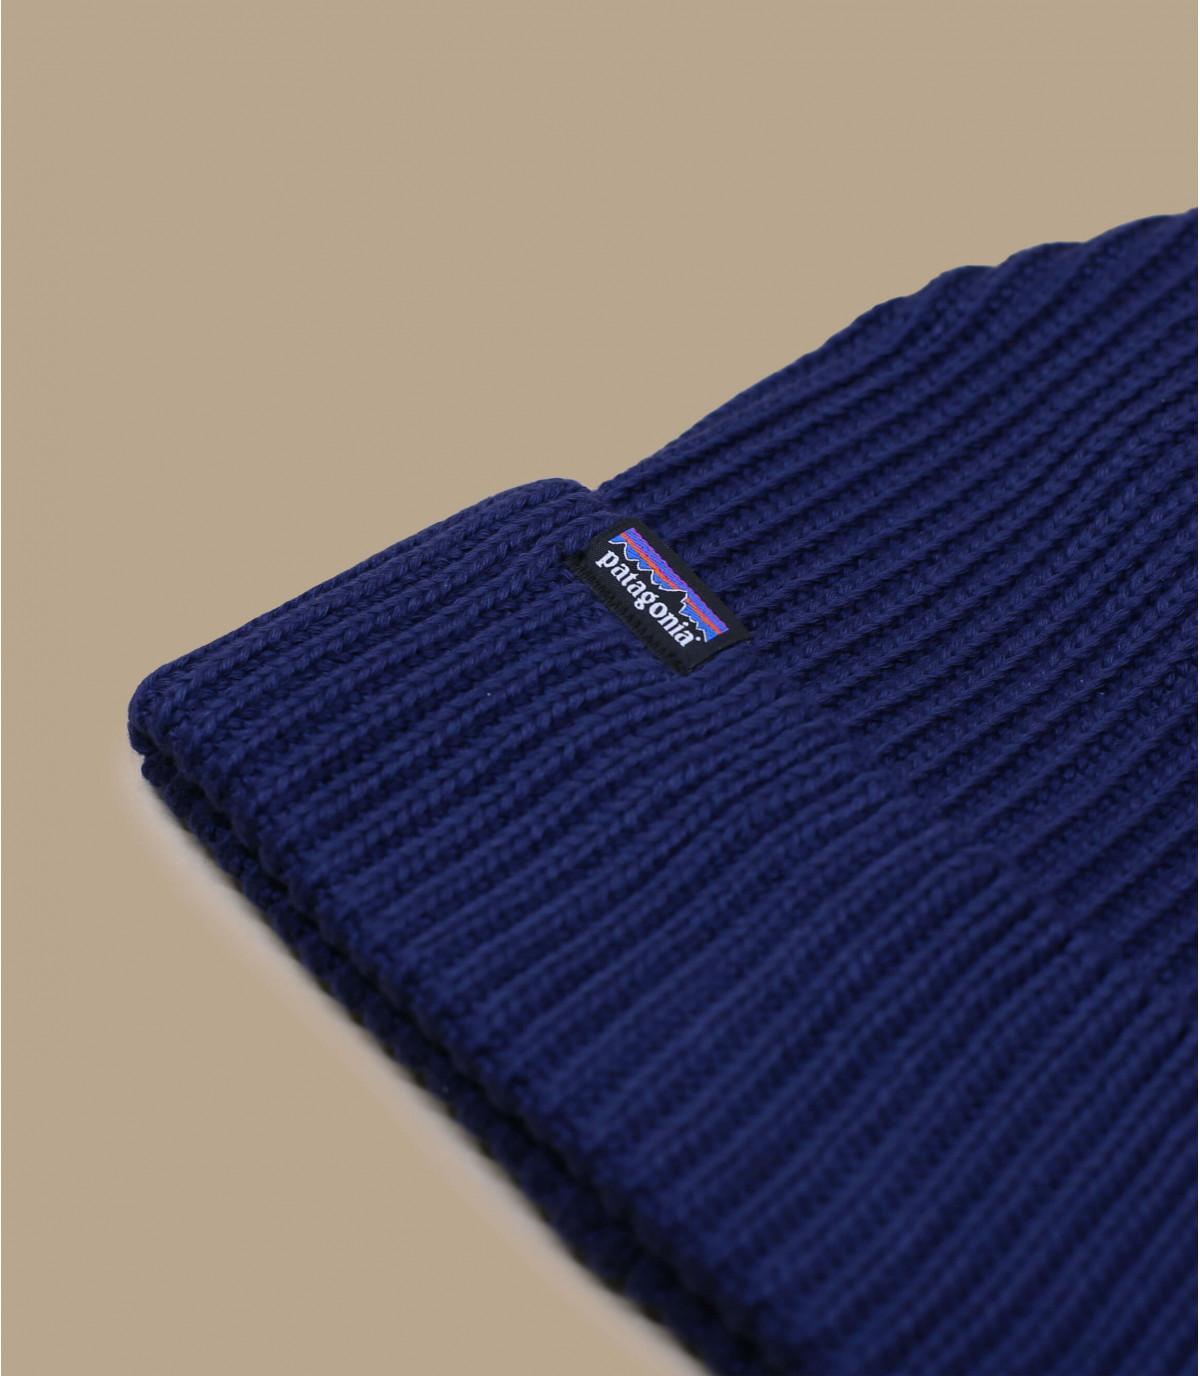 Mütze Revers blau Patagonia